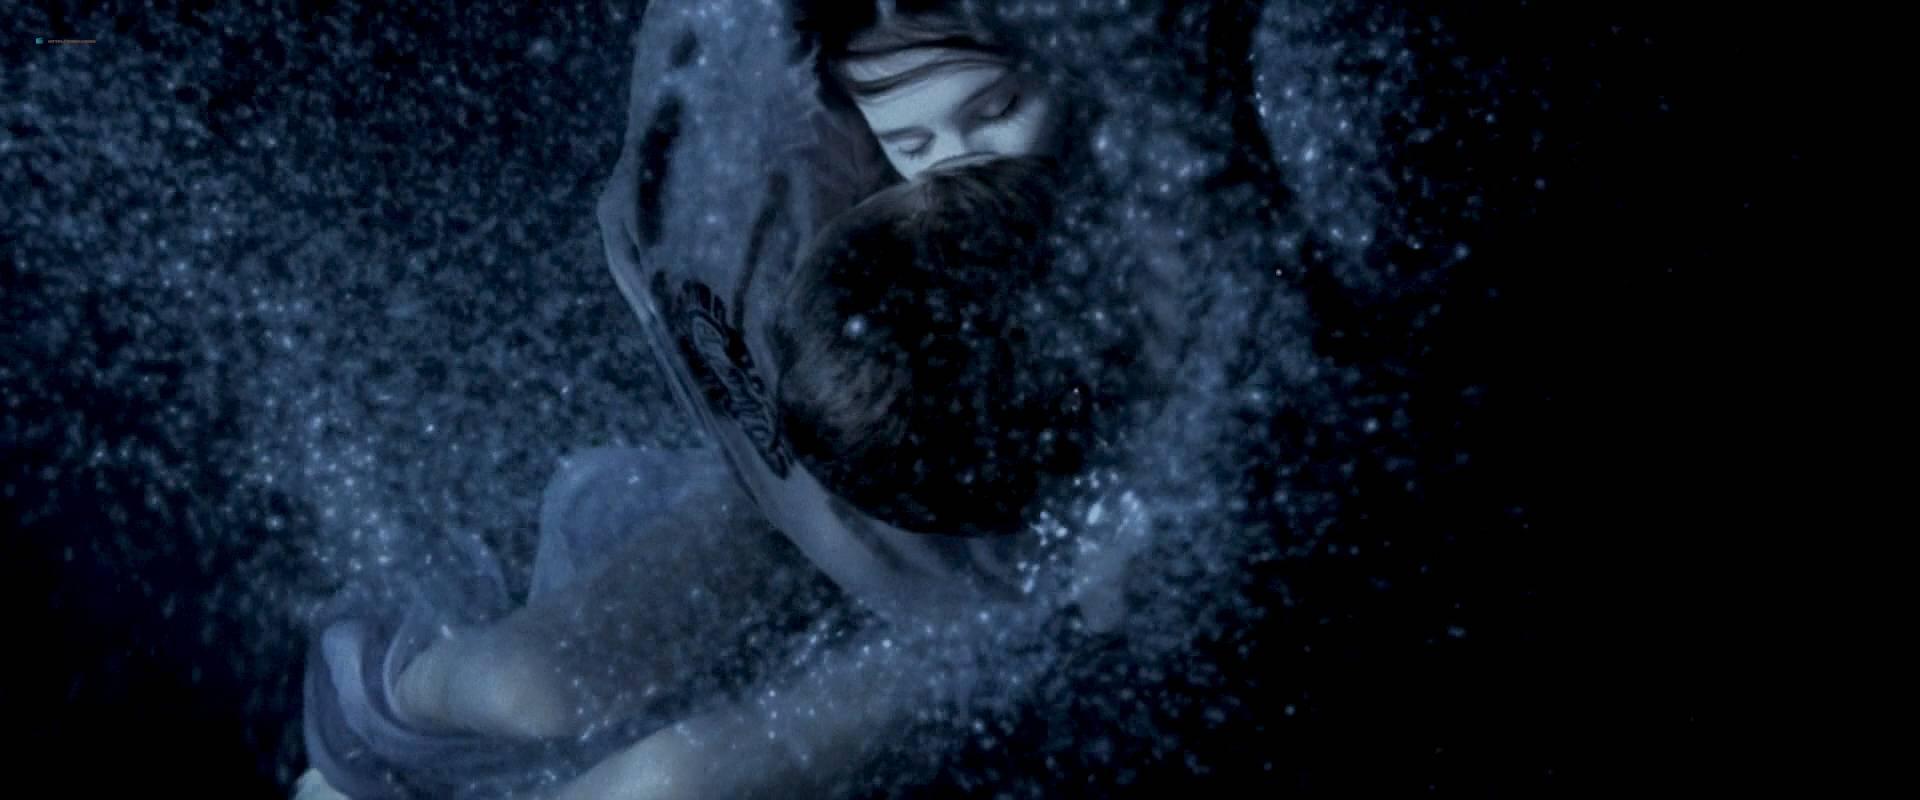 Virginie Ledoyen nude topless Tilda Swinton hot sex - The Beach (2000) HD 1080p BluRay (10)